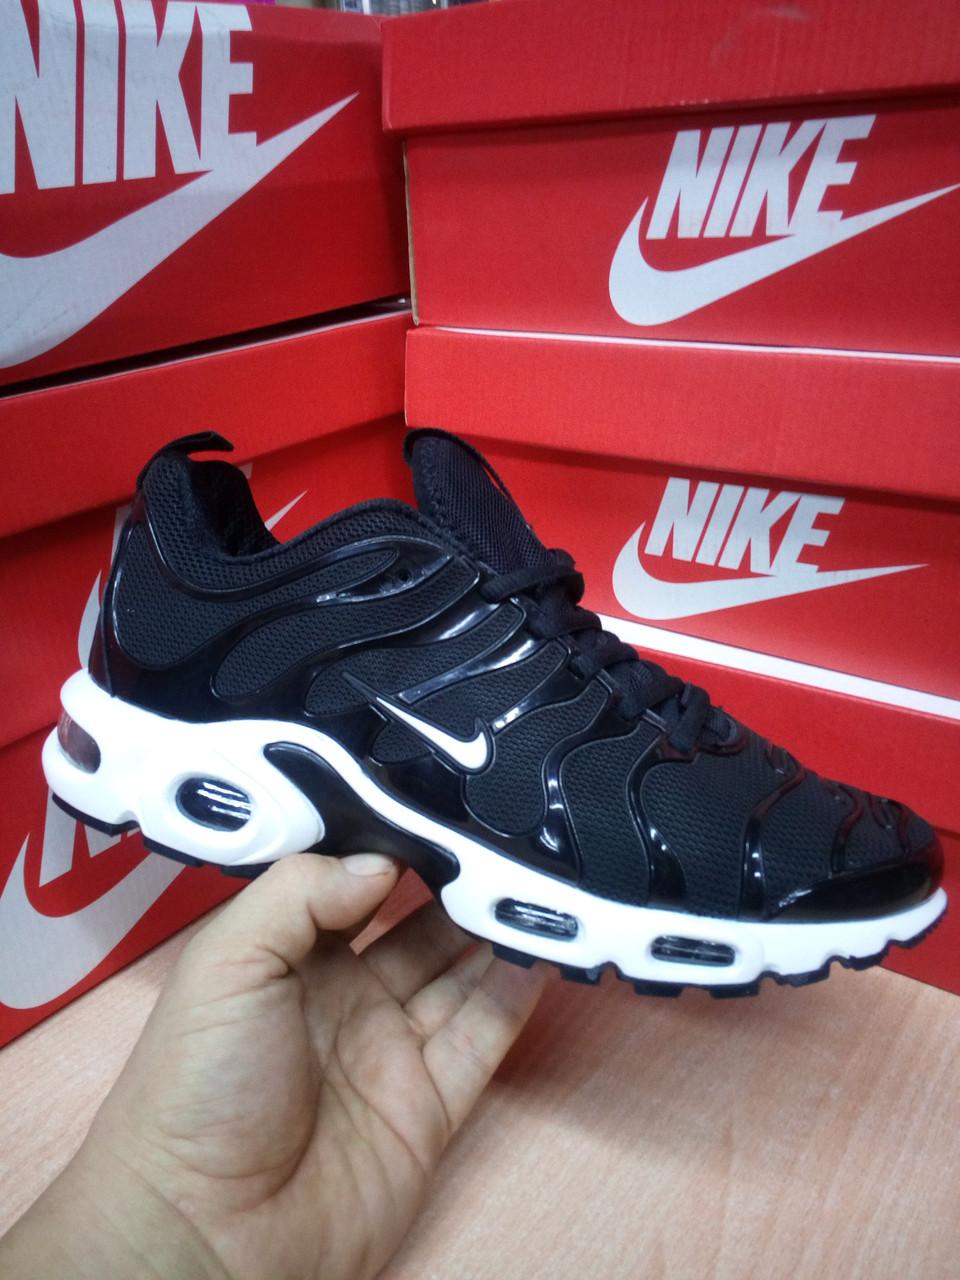 1249b586 Мужские кроссовки Найк Аир Макс Тн Плюс/Nike Air Max Tn Plus , фото 2 ...